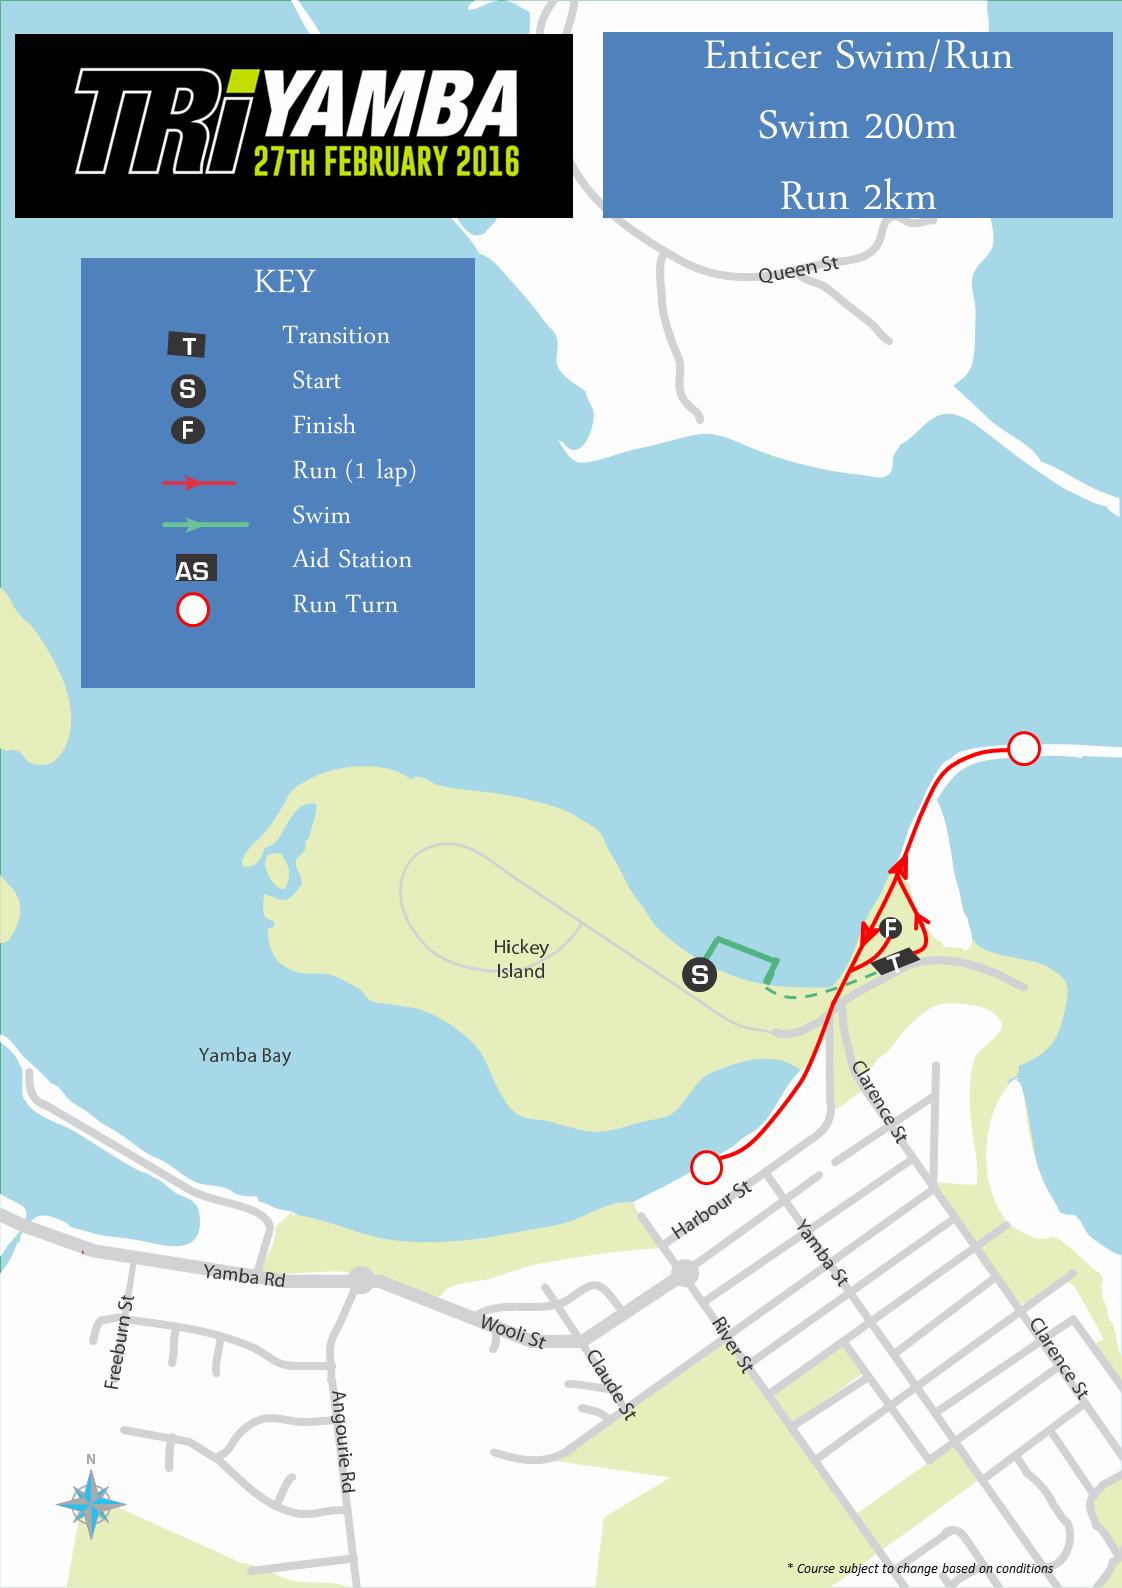 http://www.eliteenergy.com.au/wp-content/uploads/2015/06/Enticer-Run-Swim-Course-Map-2016.png